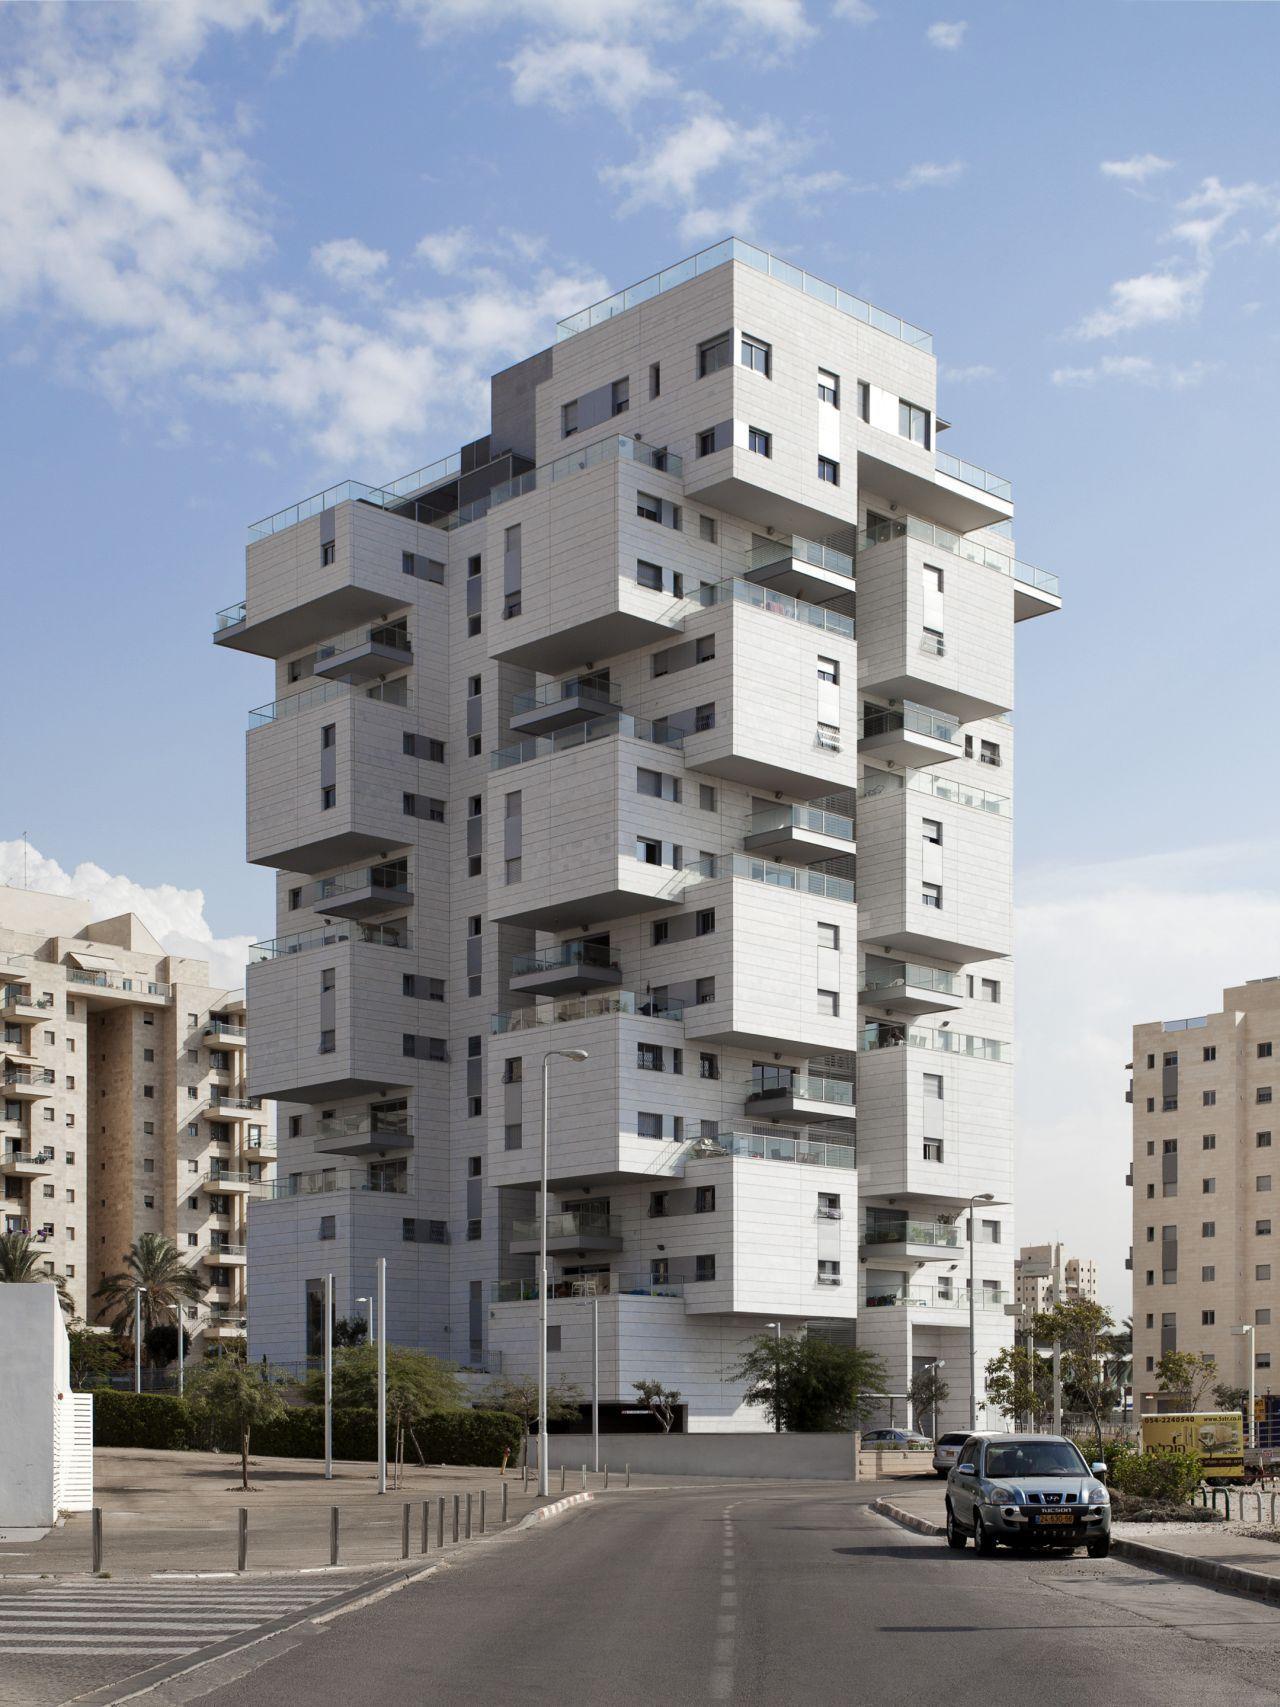 Pin von Guillermo Traibel auf Apartment Buildings | Pinterest